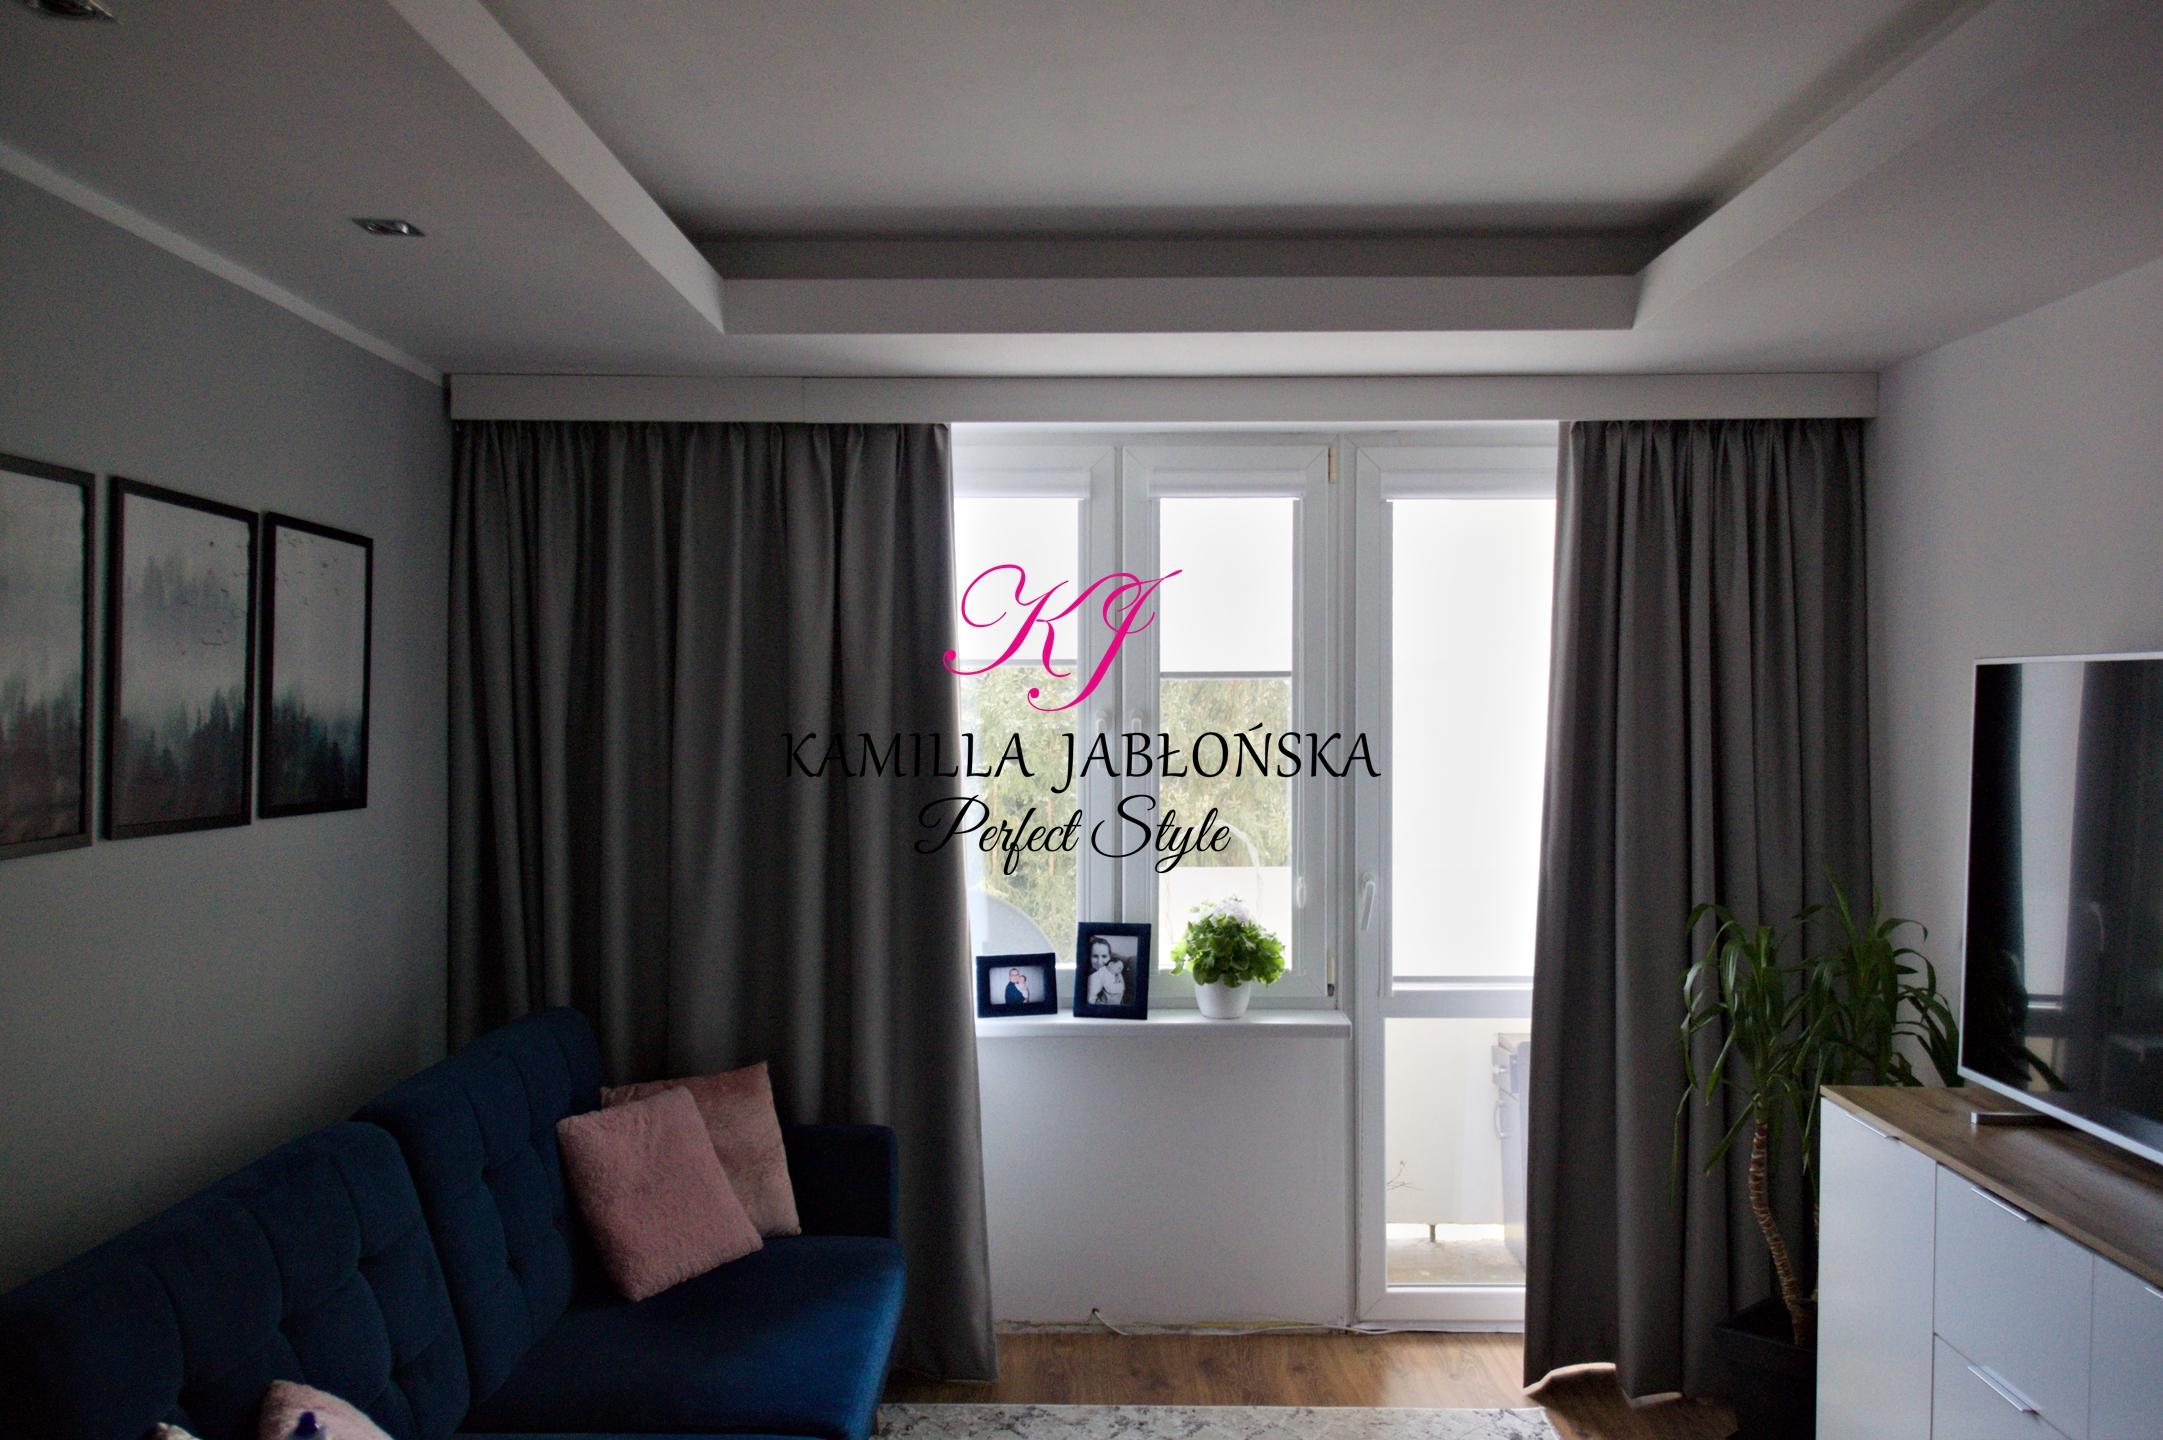 002Perfect Style Kamilla Jabłońska